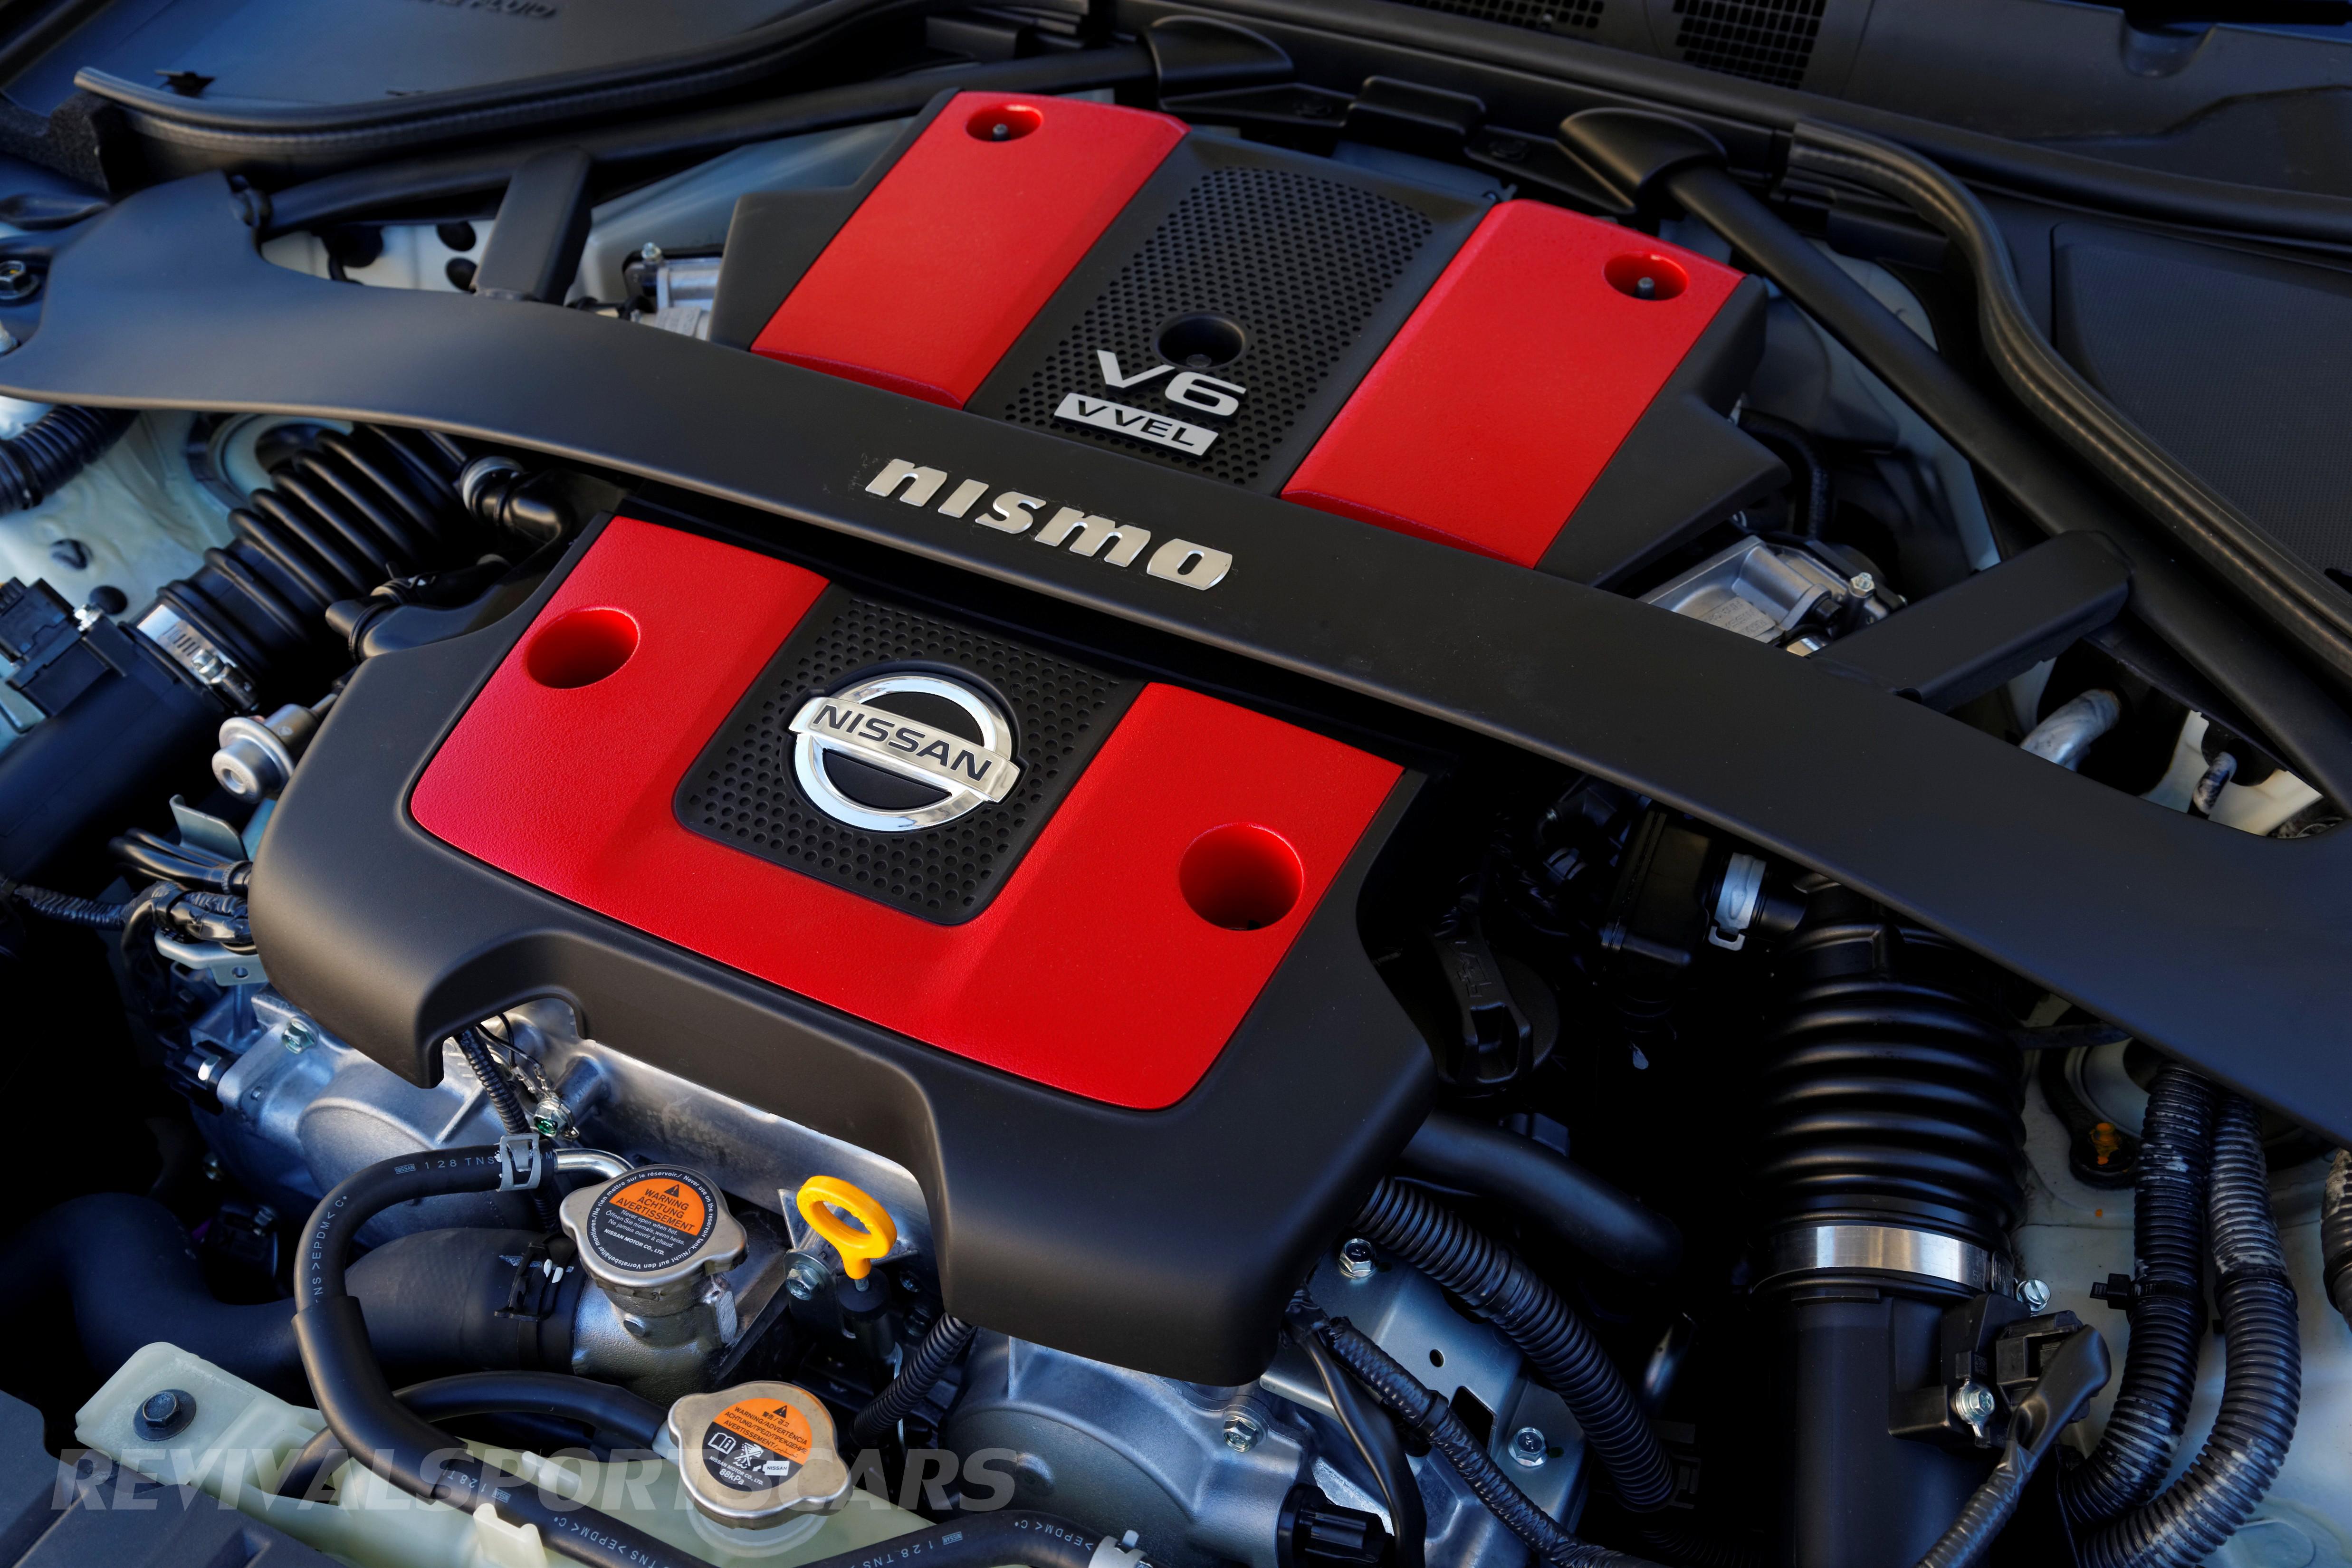 Nismo 370Z UK Edition High Resolution Quality 3.7 litre engine bay